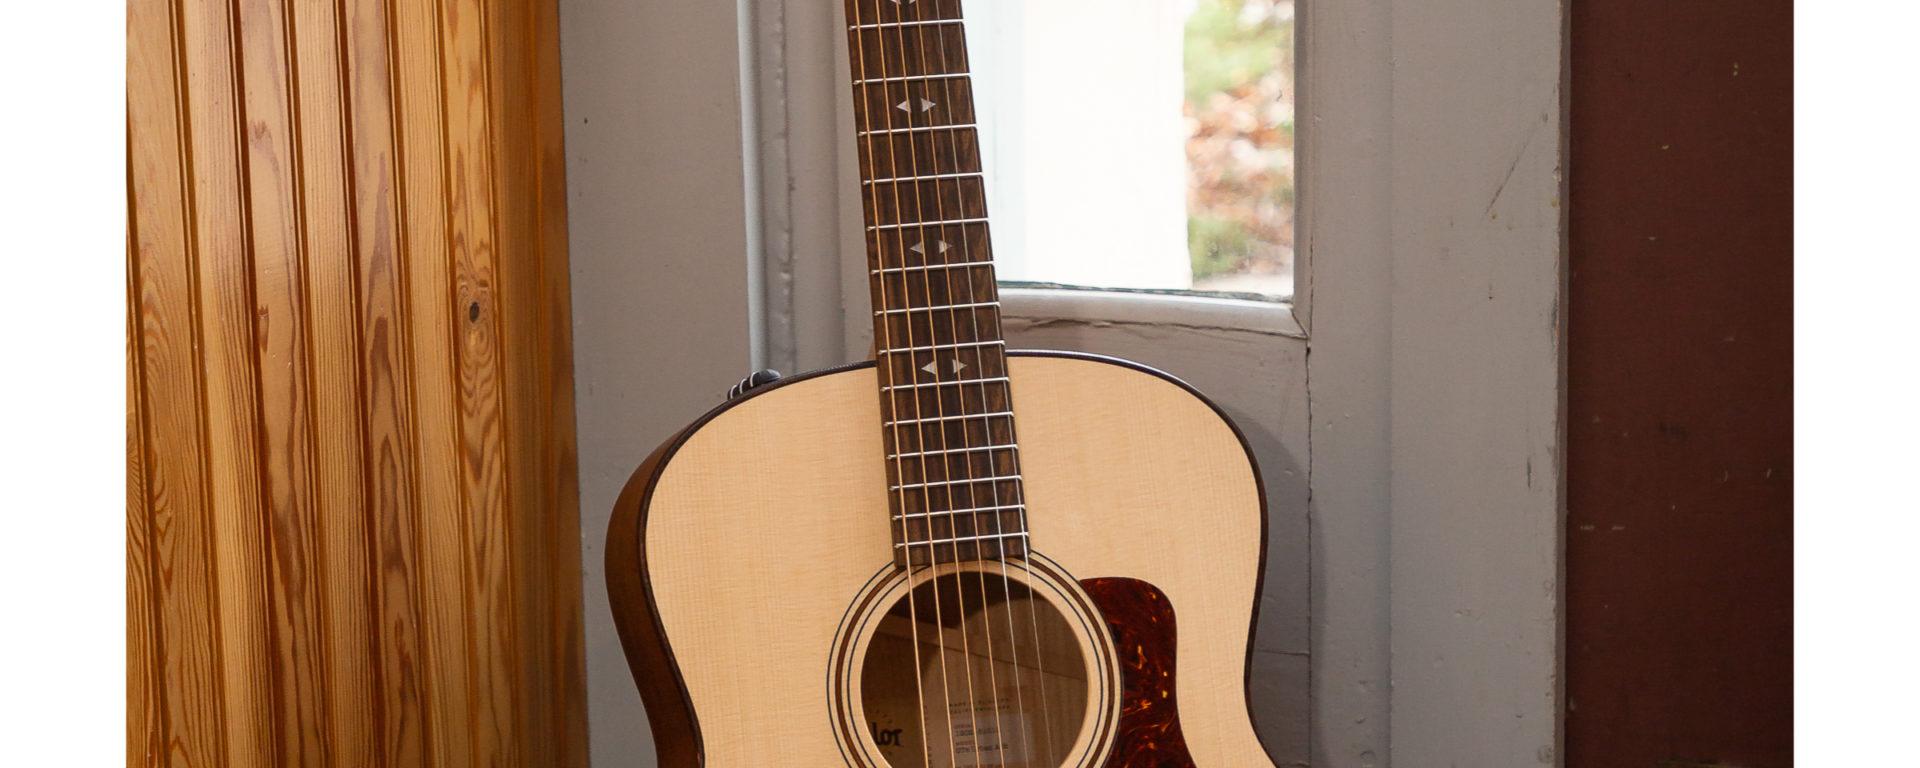 Taylor Guitars - Grand Theater GTE Urban Ash